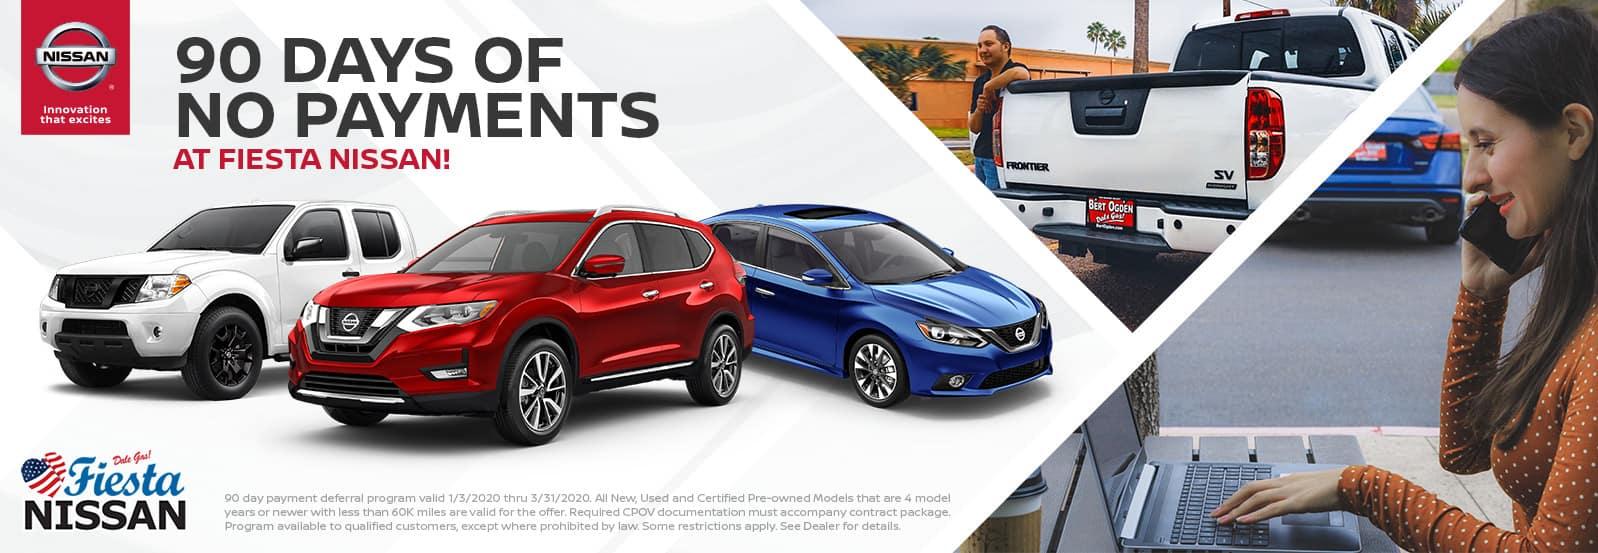 90 Days of No Payments at Fiesta Nissan in Edinburg, TX